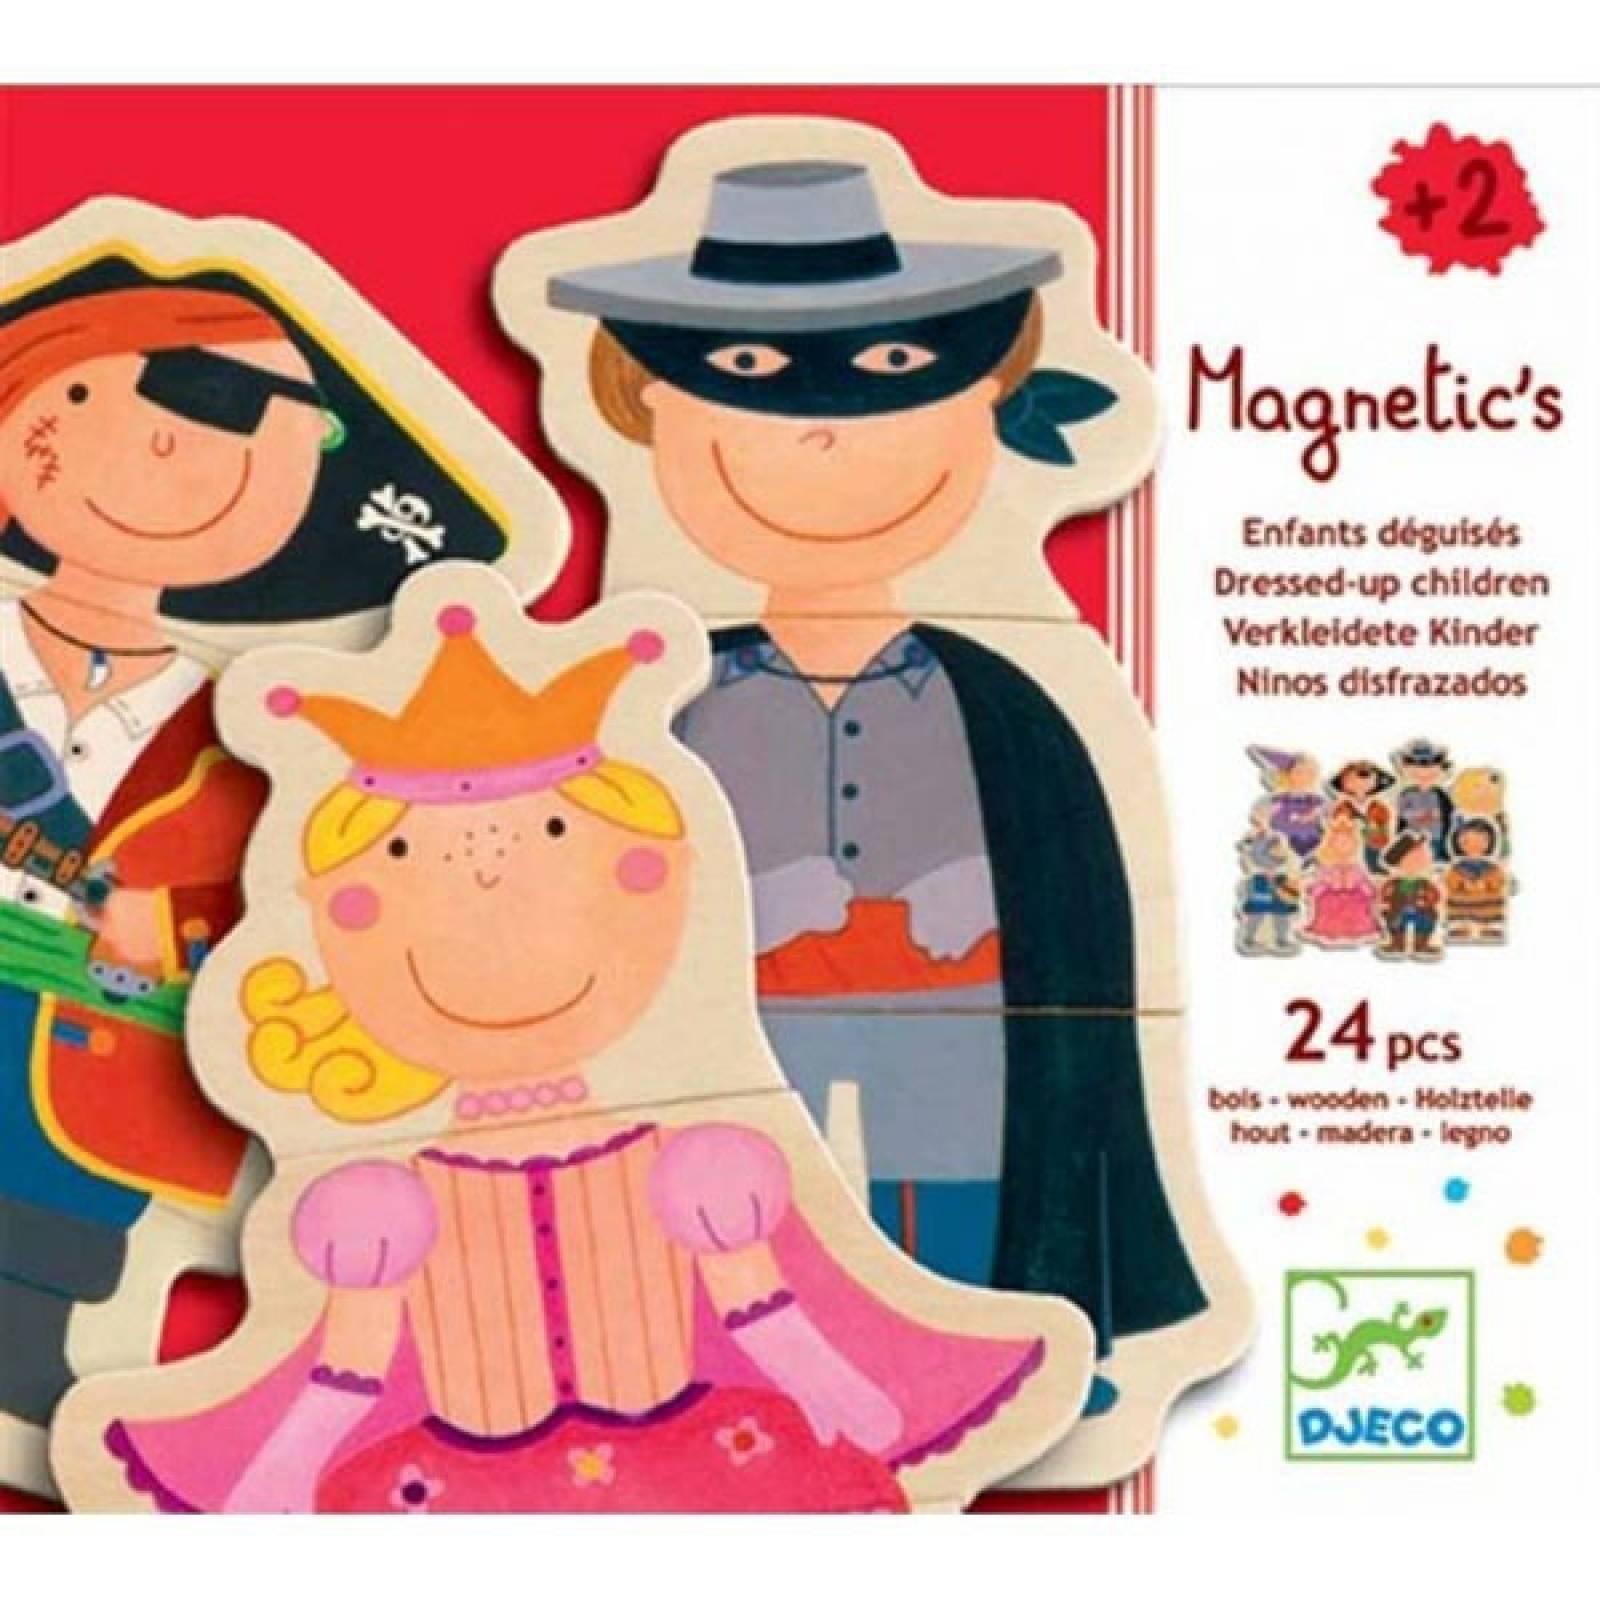 Fancy Children 24 Piece Magnetic Puzzle Figures In Box Djeco 2+